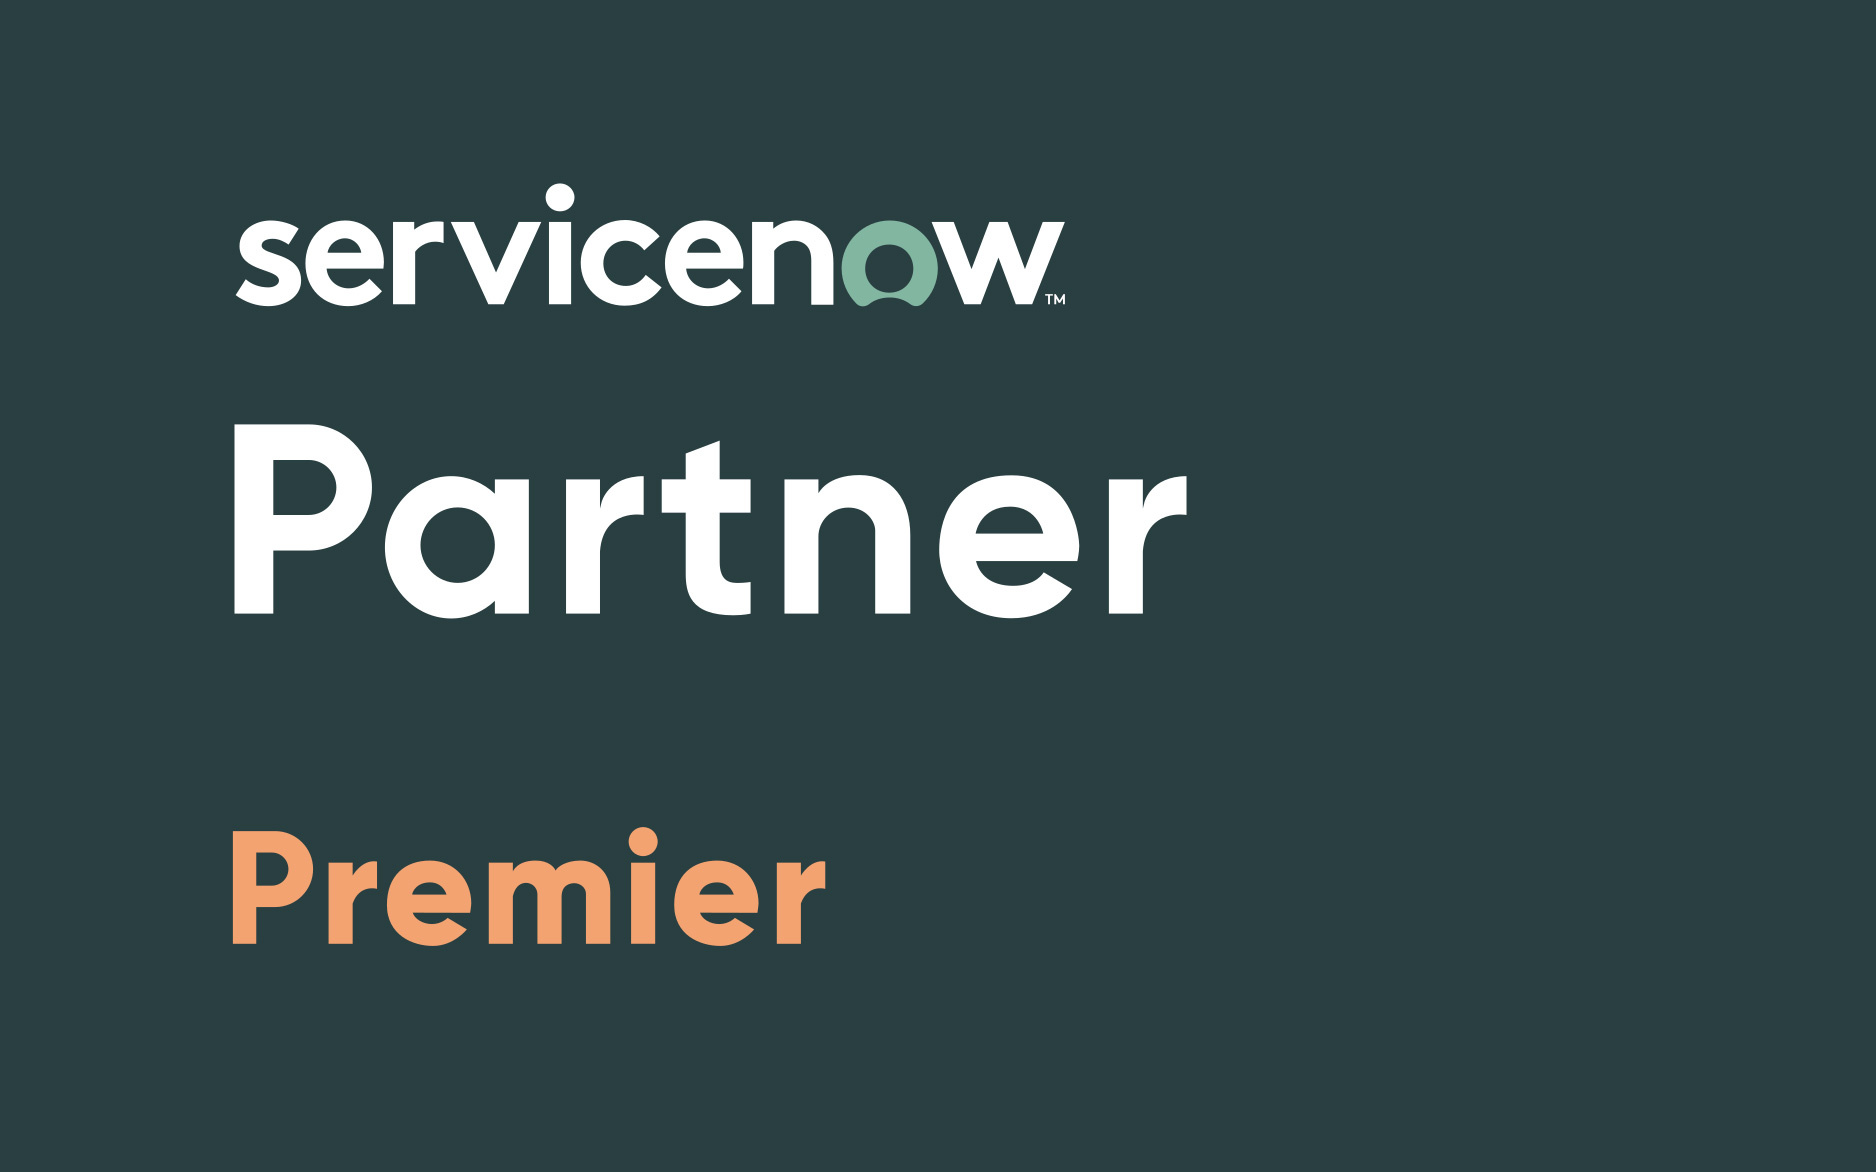 Partner Premier Servicenow